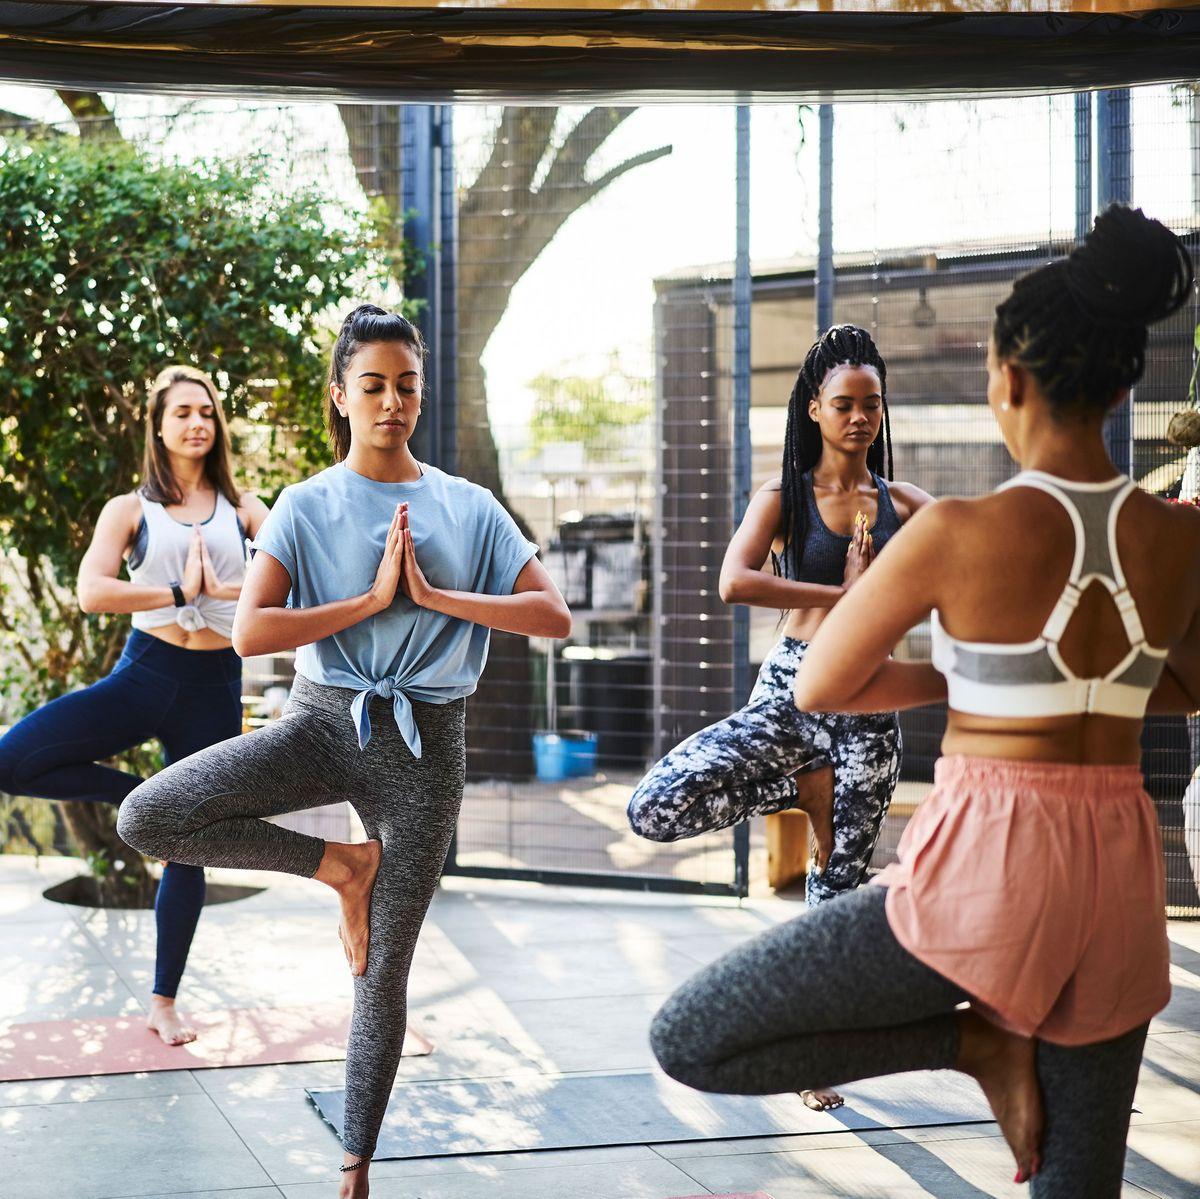 Yogaworks Teachers Unionize To Heal The Wellness Industry